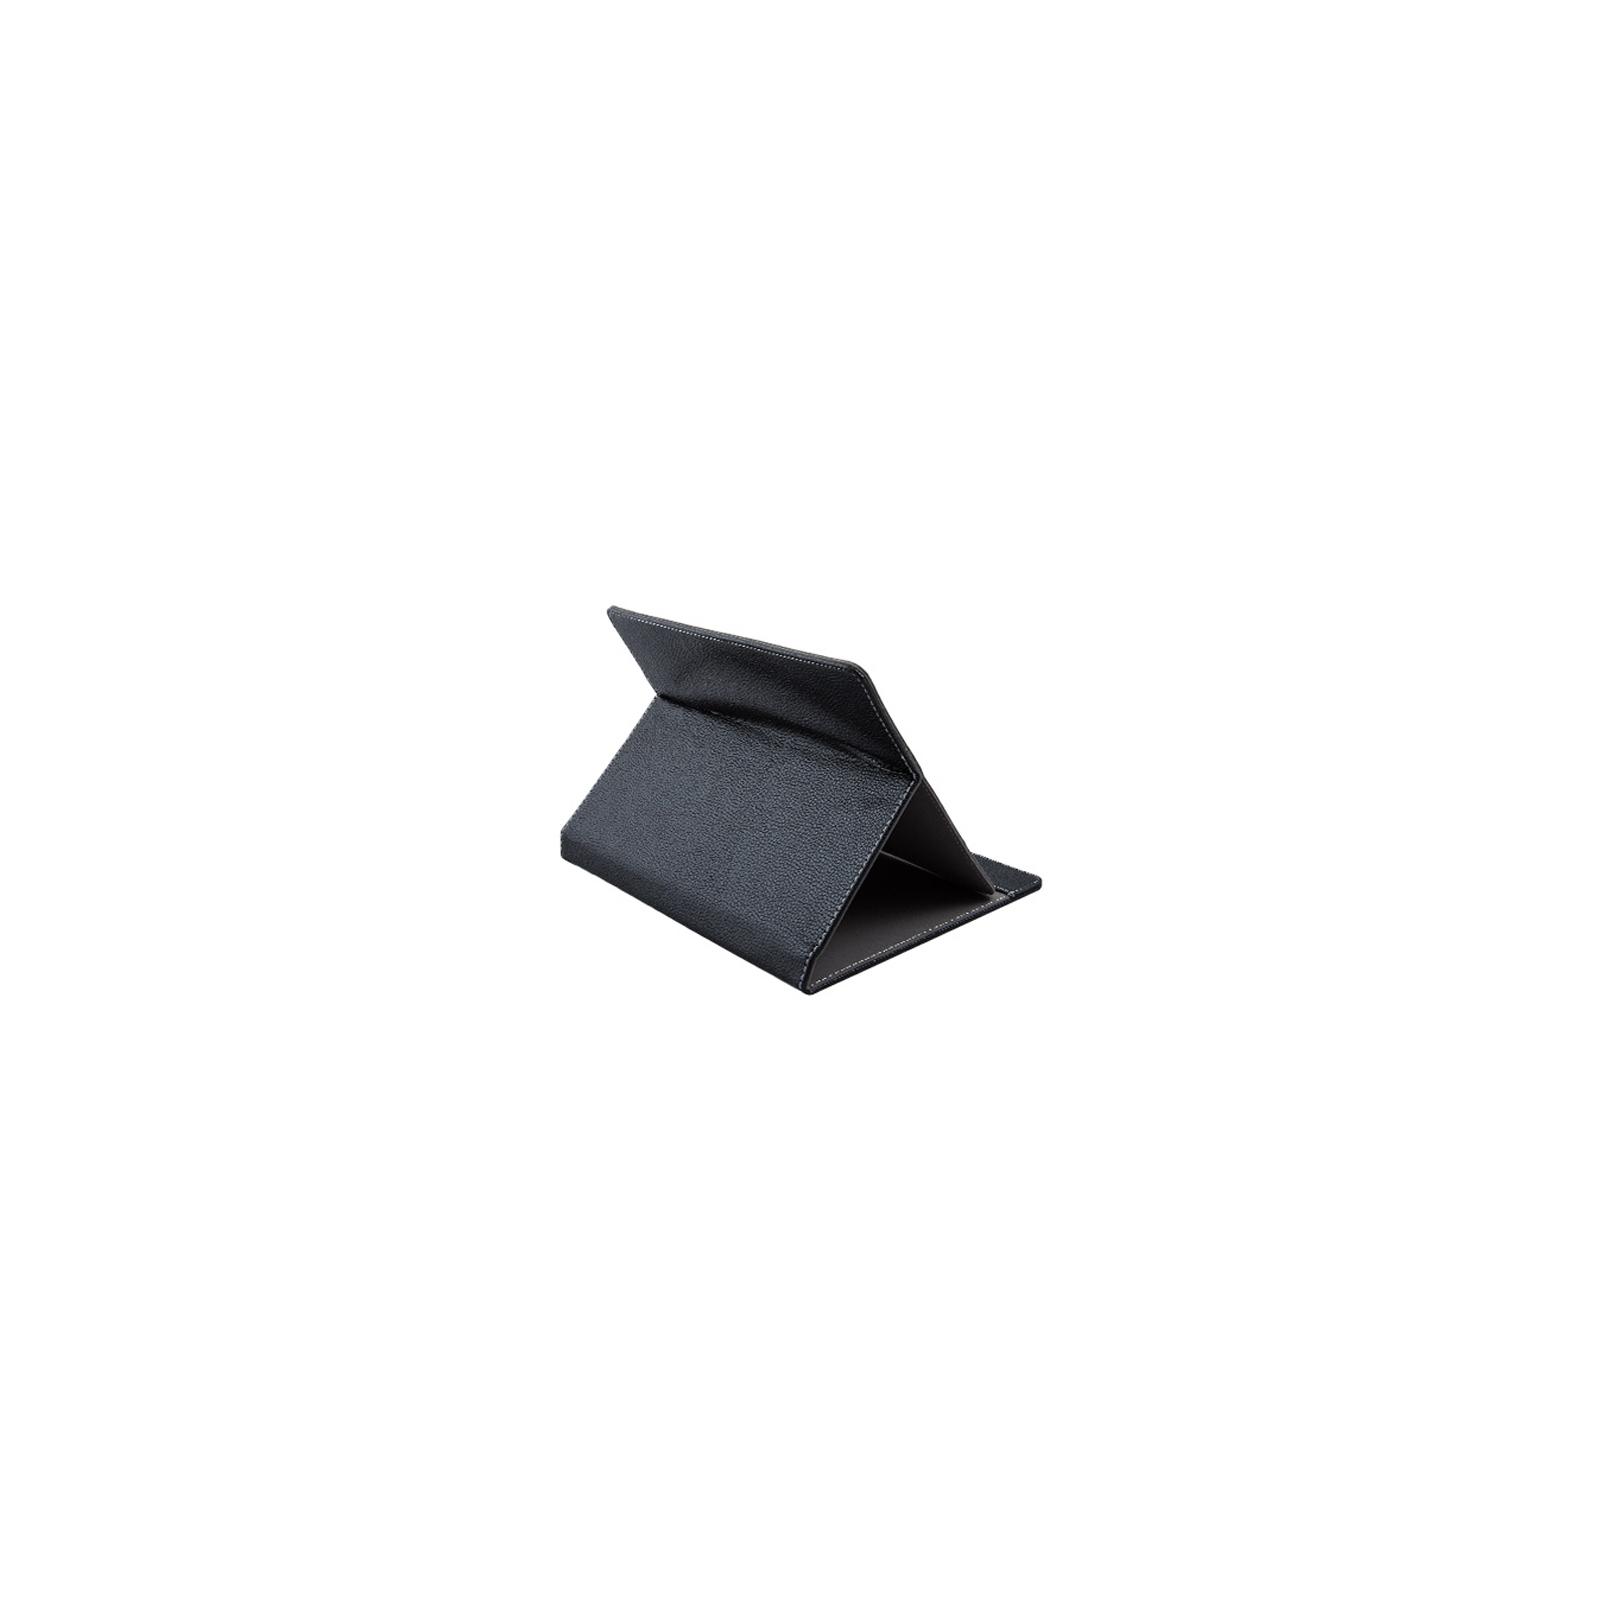 "Чехол для планшета Drobak 10""-10.1"" Universal Stand Black (216883) изображение 4"